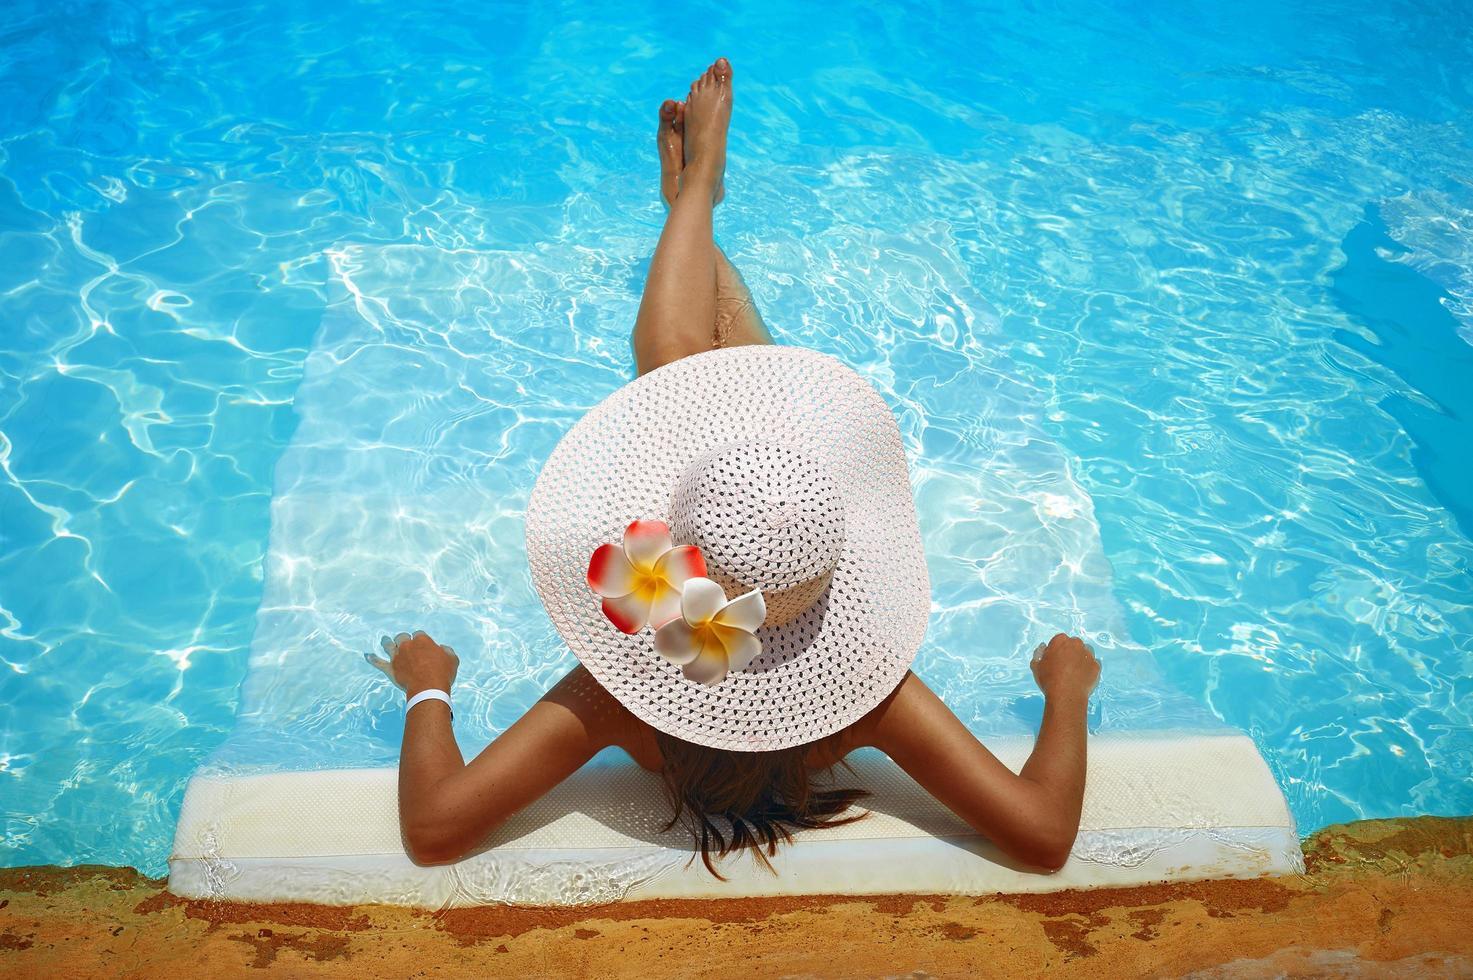 kvinna i vit hatt lounging i poolen foto